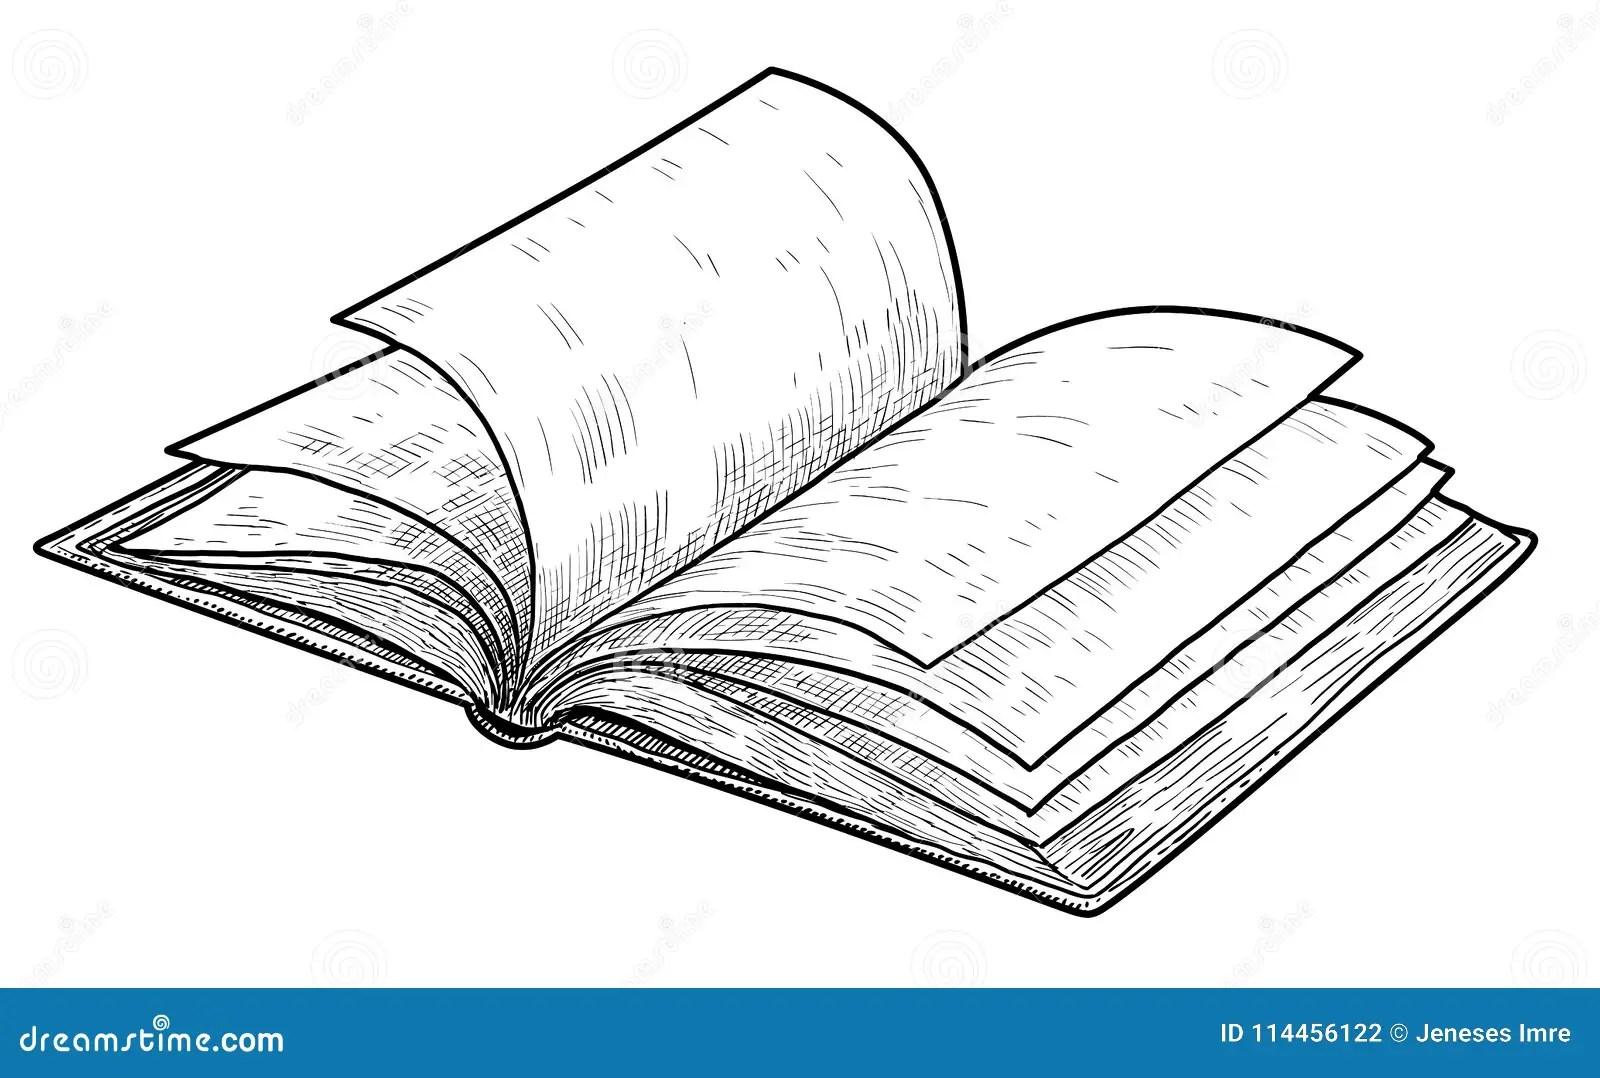 Open Book Illustration Drawing Engraving Ink Line Art